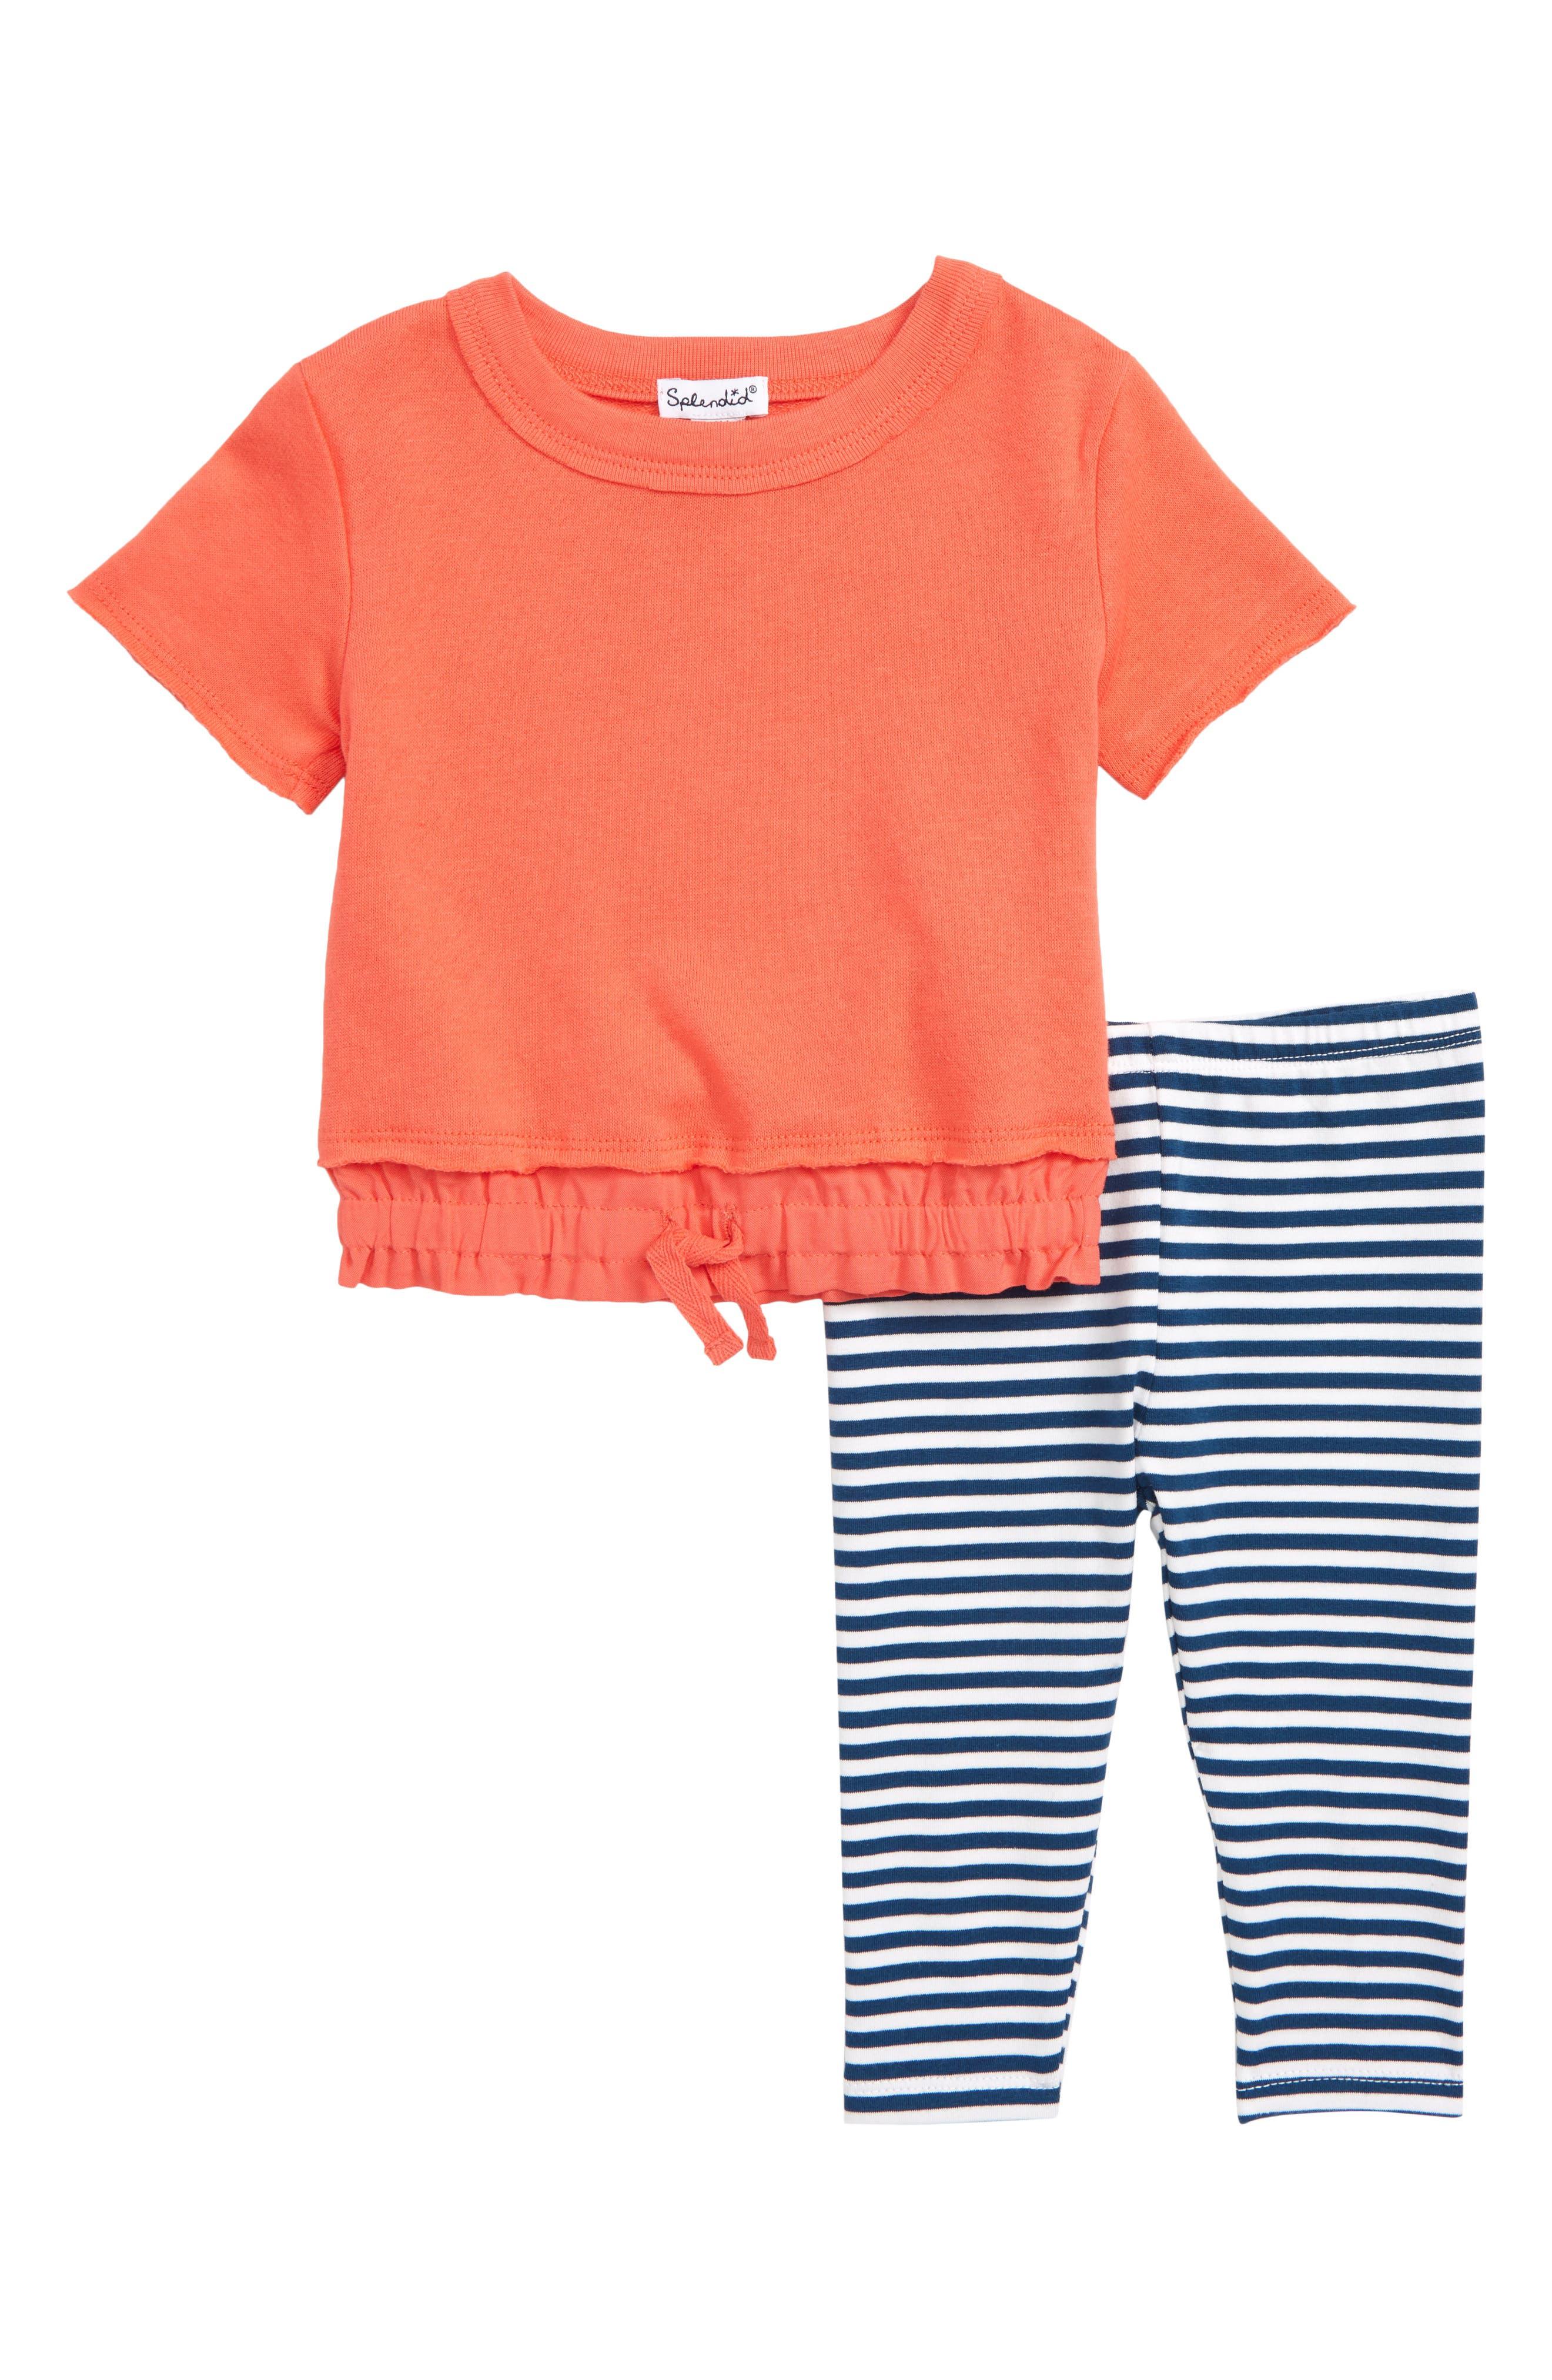 SPLENDID, Top & Stripe Pants Set, Main thumbnail 1, color, CORAL LIPSTICK